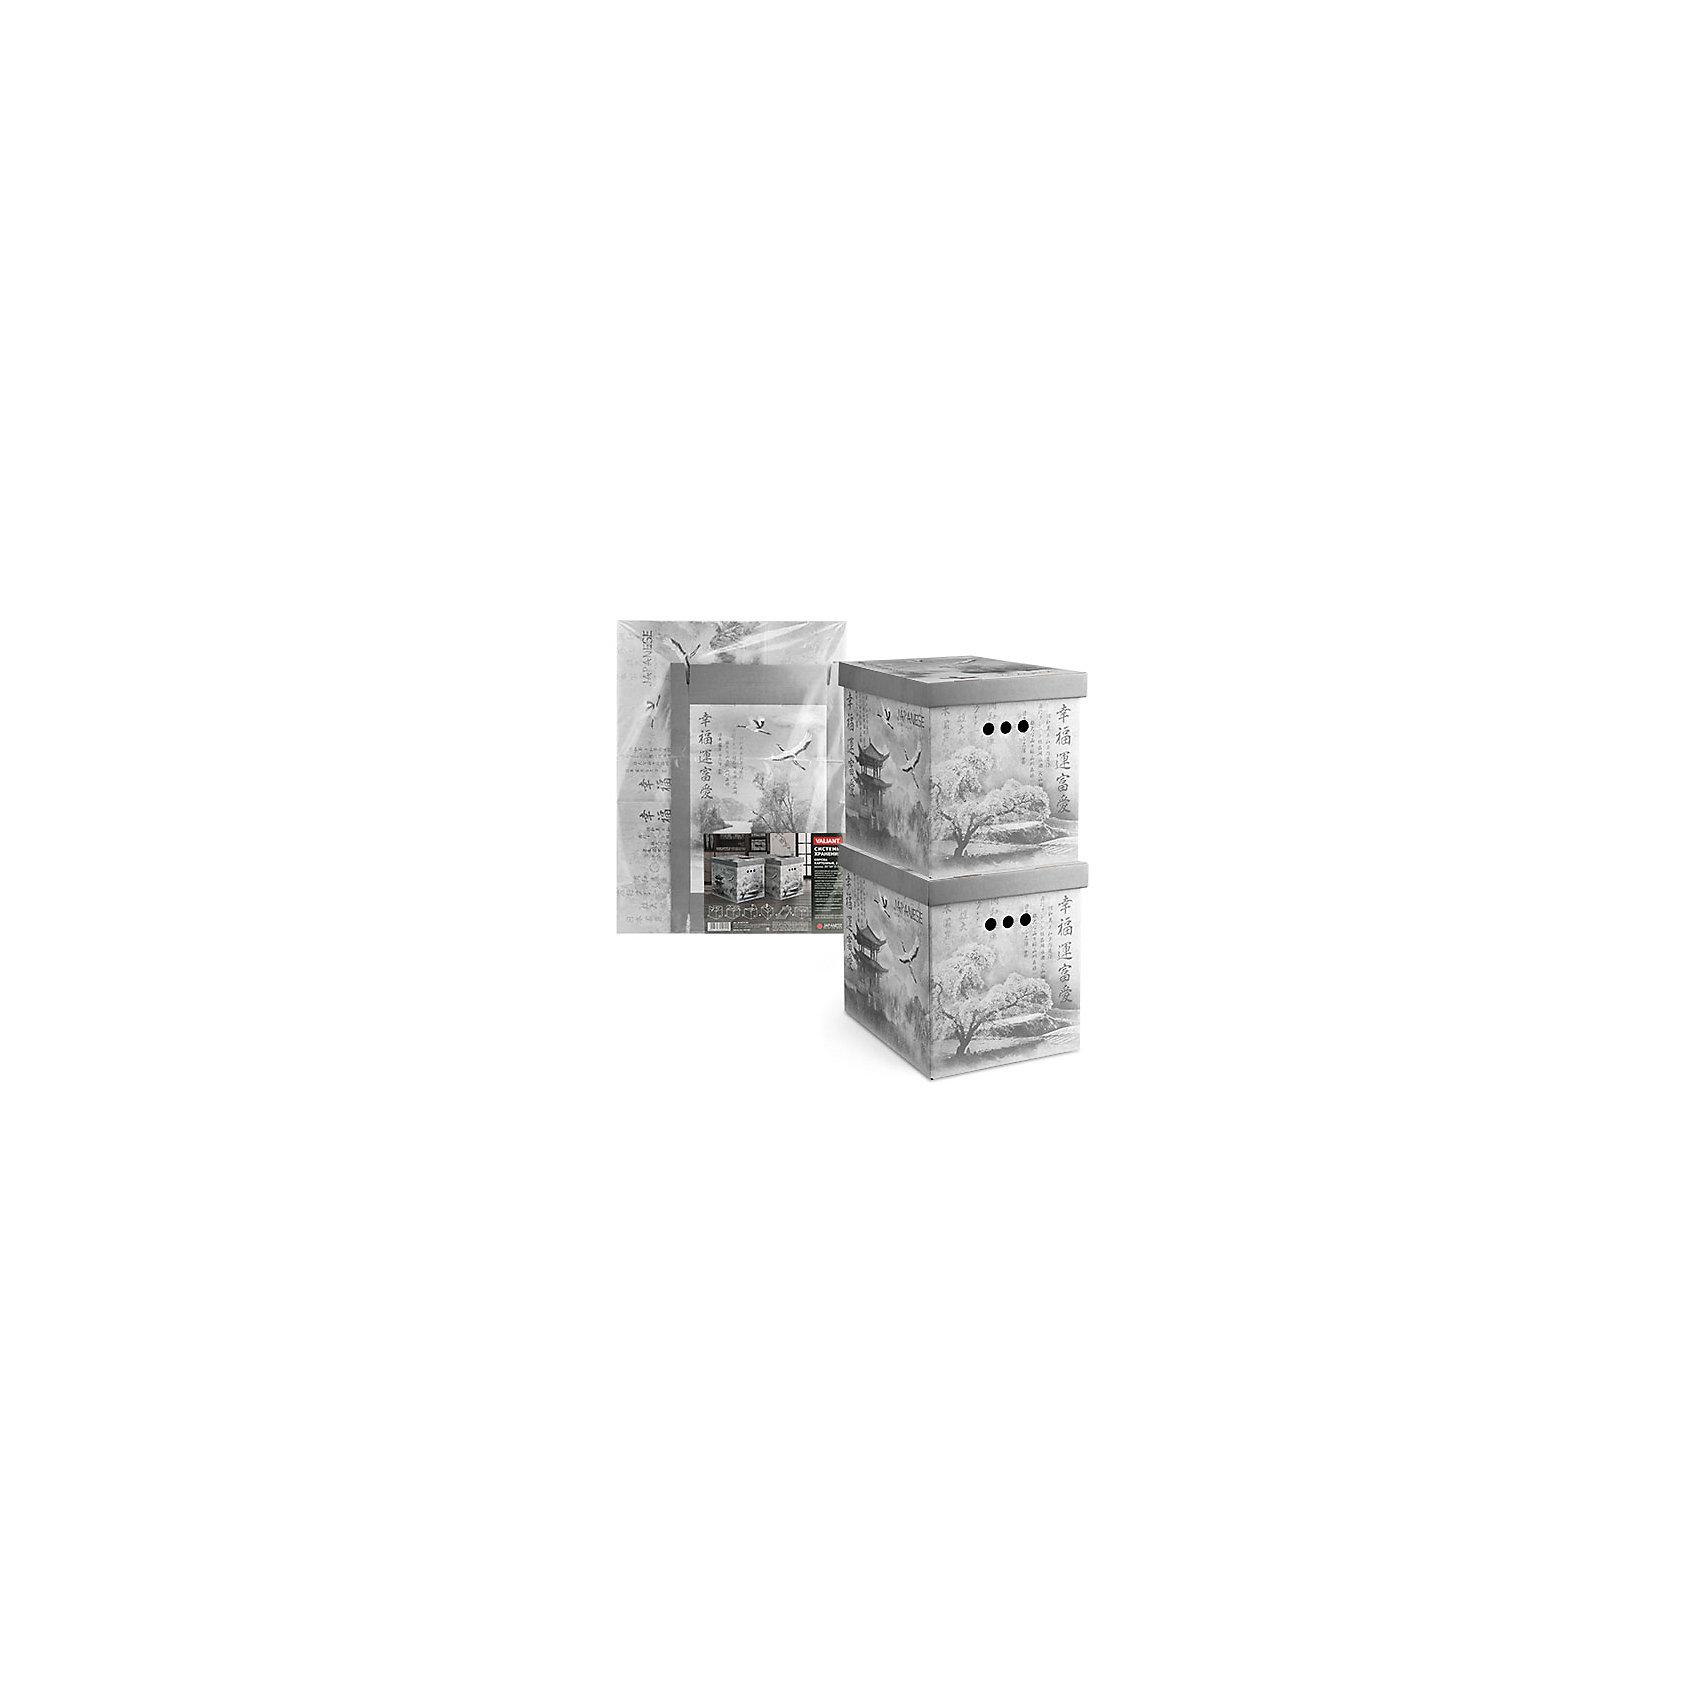 VALIANT Короб картонный, складной, большой, 28*38*31.5 см, 2 шт., JAPANESE BLACK, Valiant valiant короб картонный складной большой 28 38 31 5 см 2 шт romantic valiant